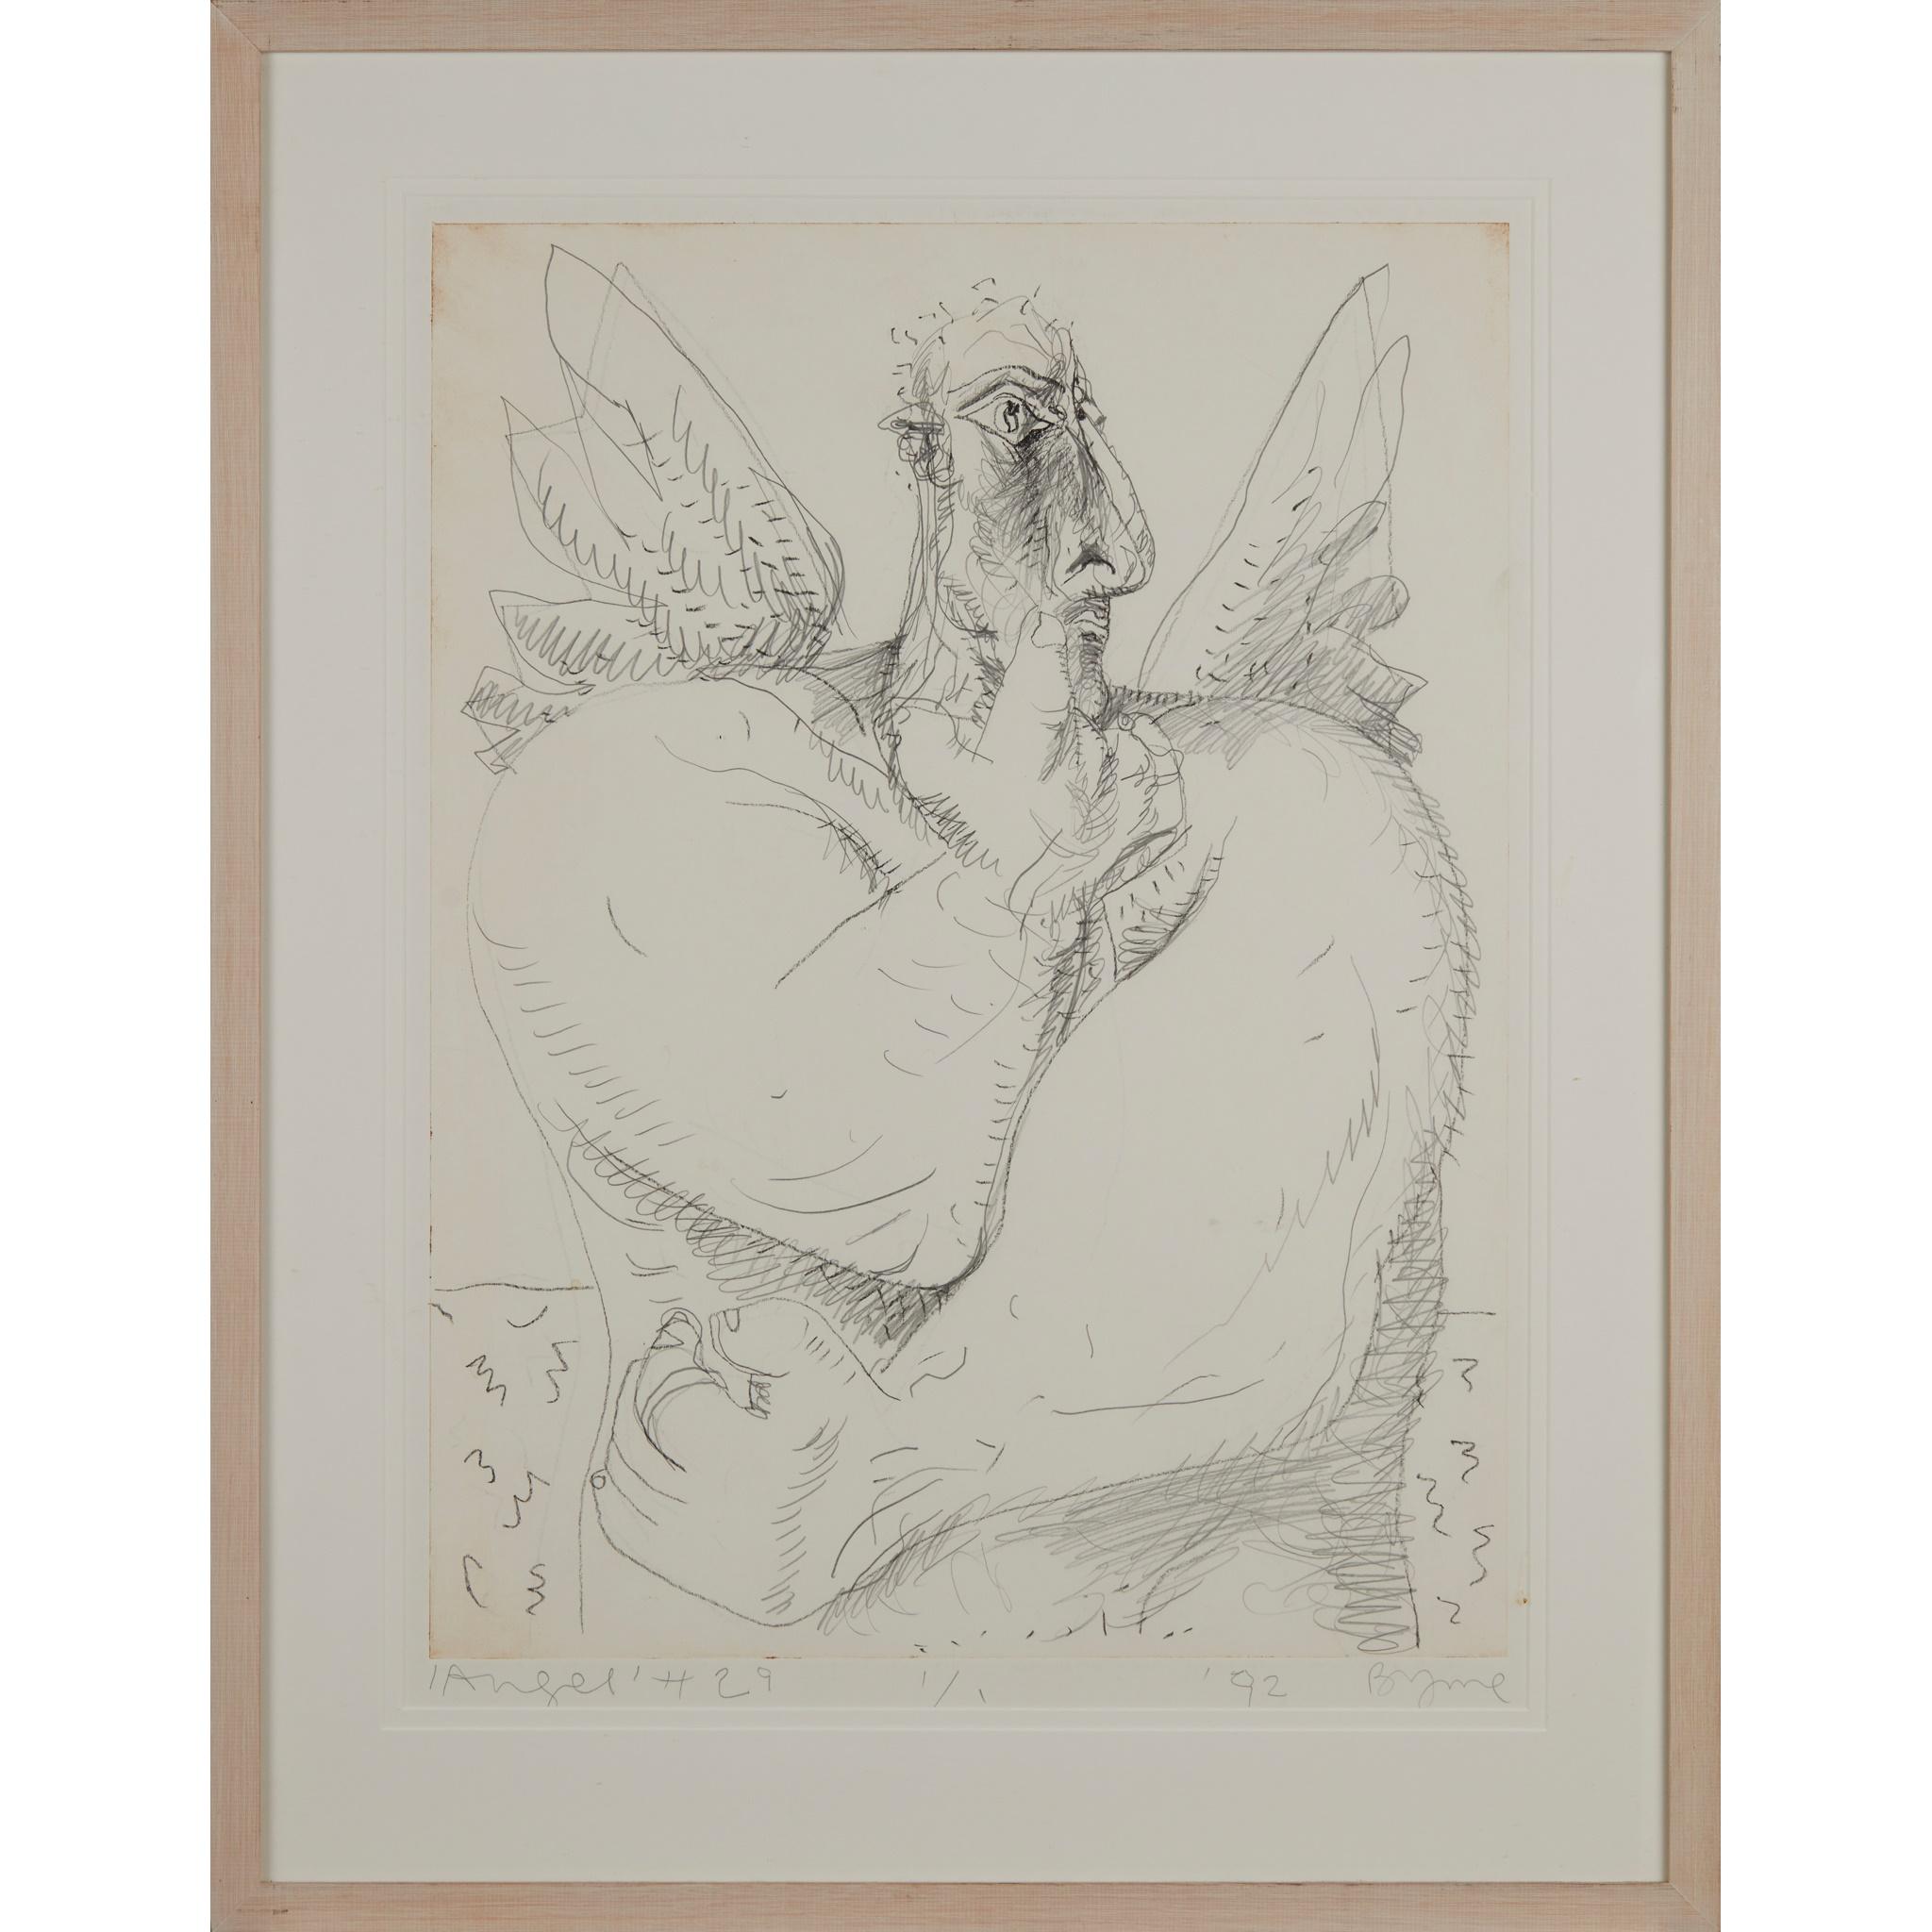 § JOHN BYRNE (SCOTTISH 1940-) 'ANGEL' #29 - Image 2 of 3